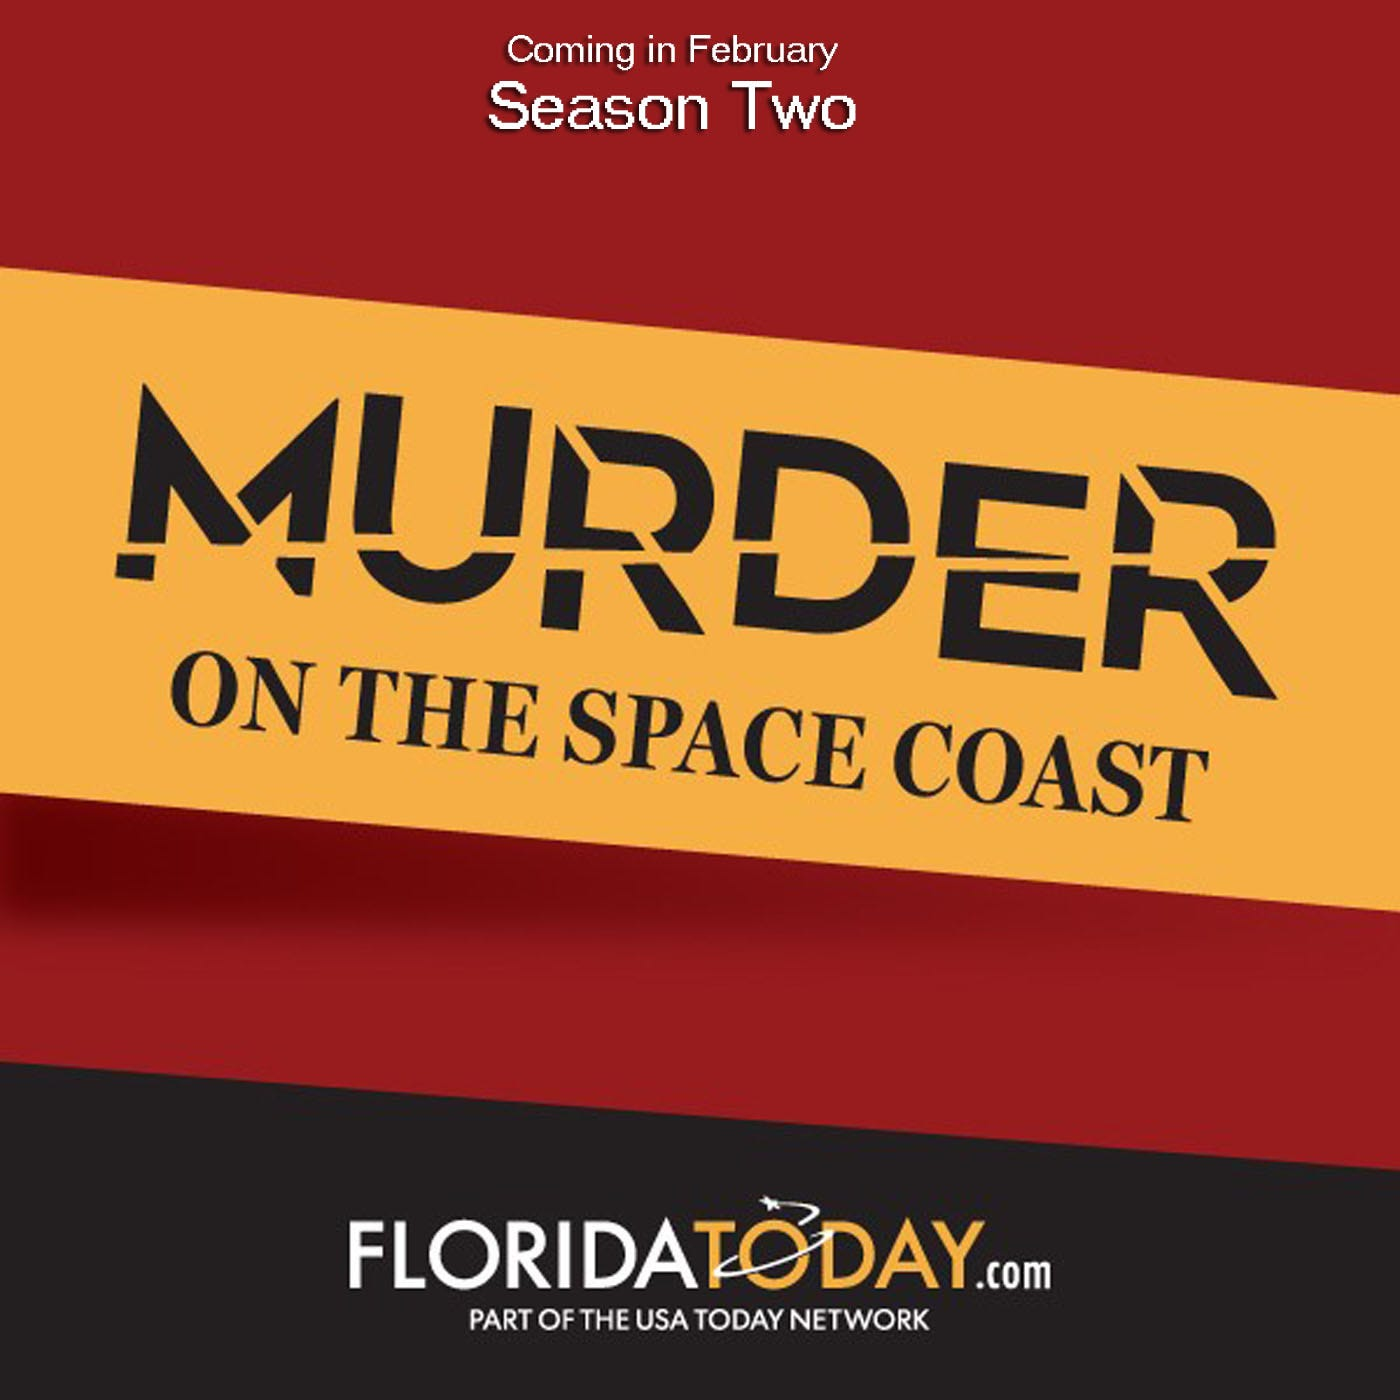 636171236470803700-EV34499668 Murder on the Space Coast Season 2: Episodes